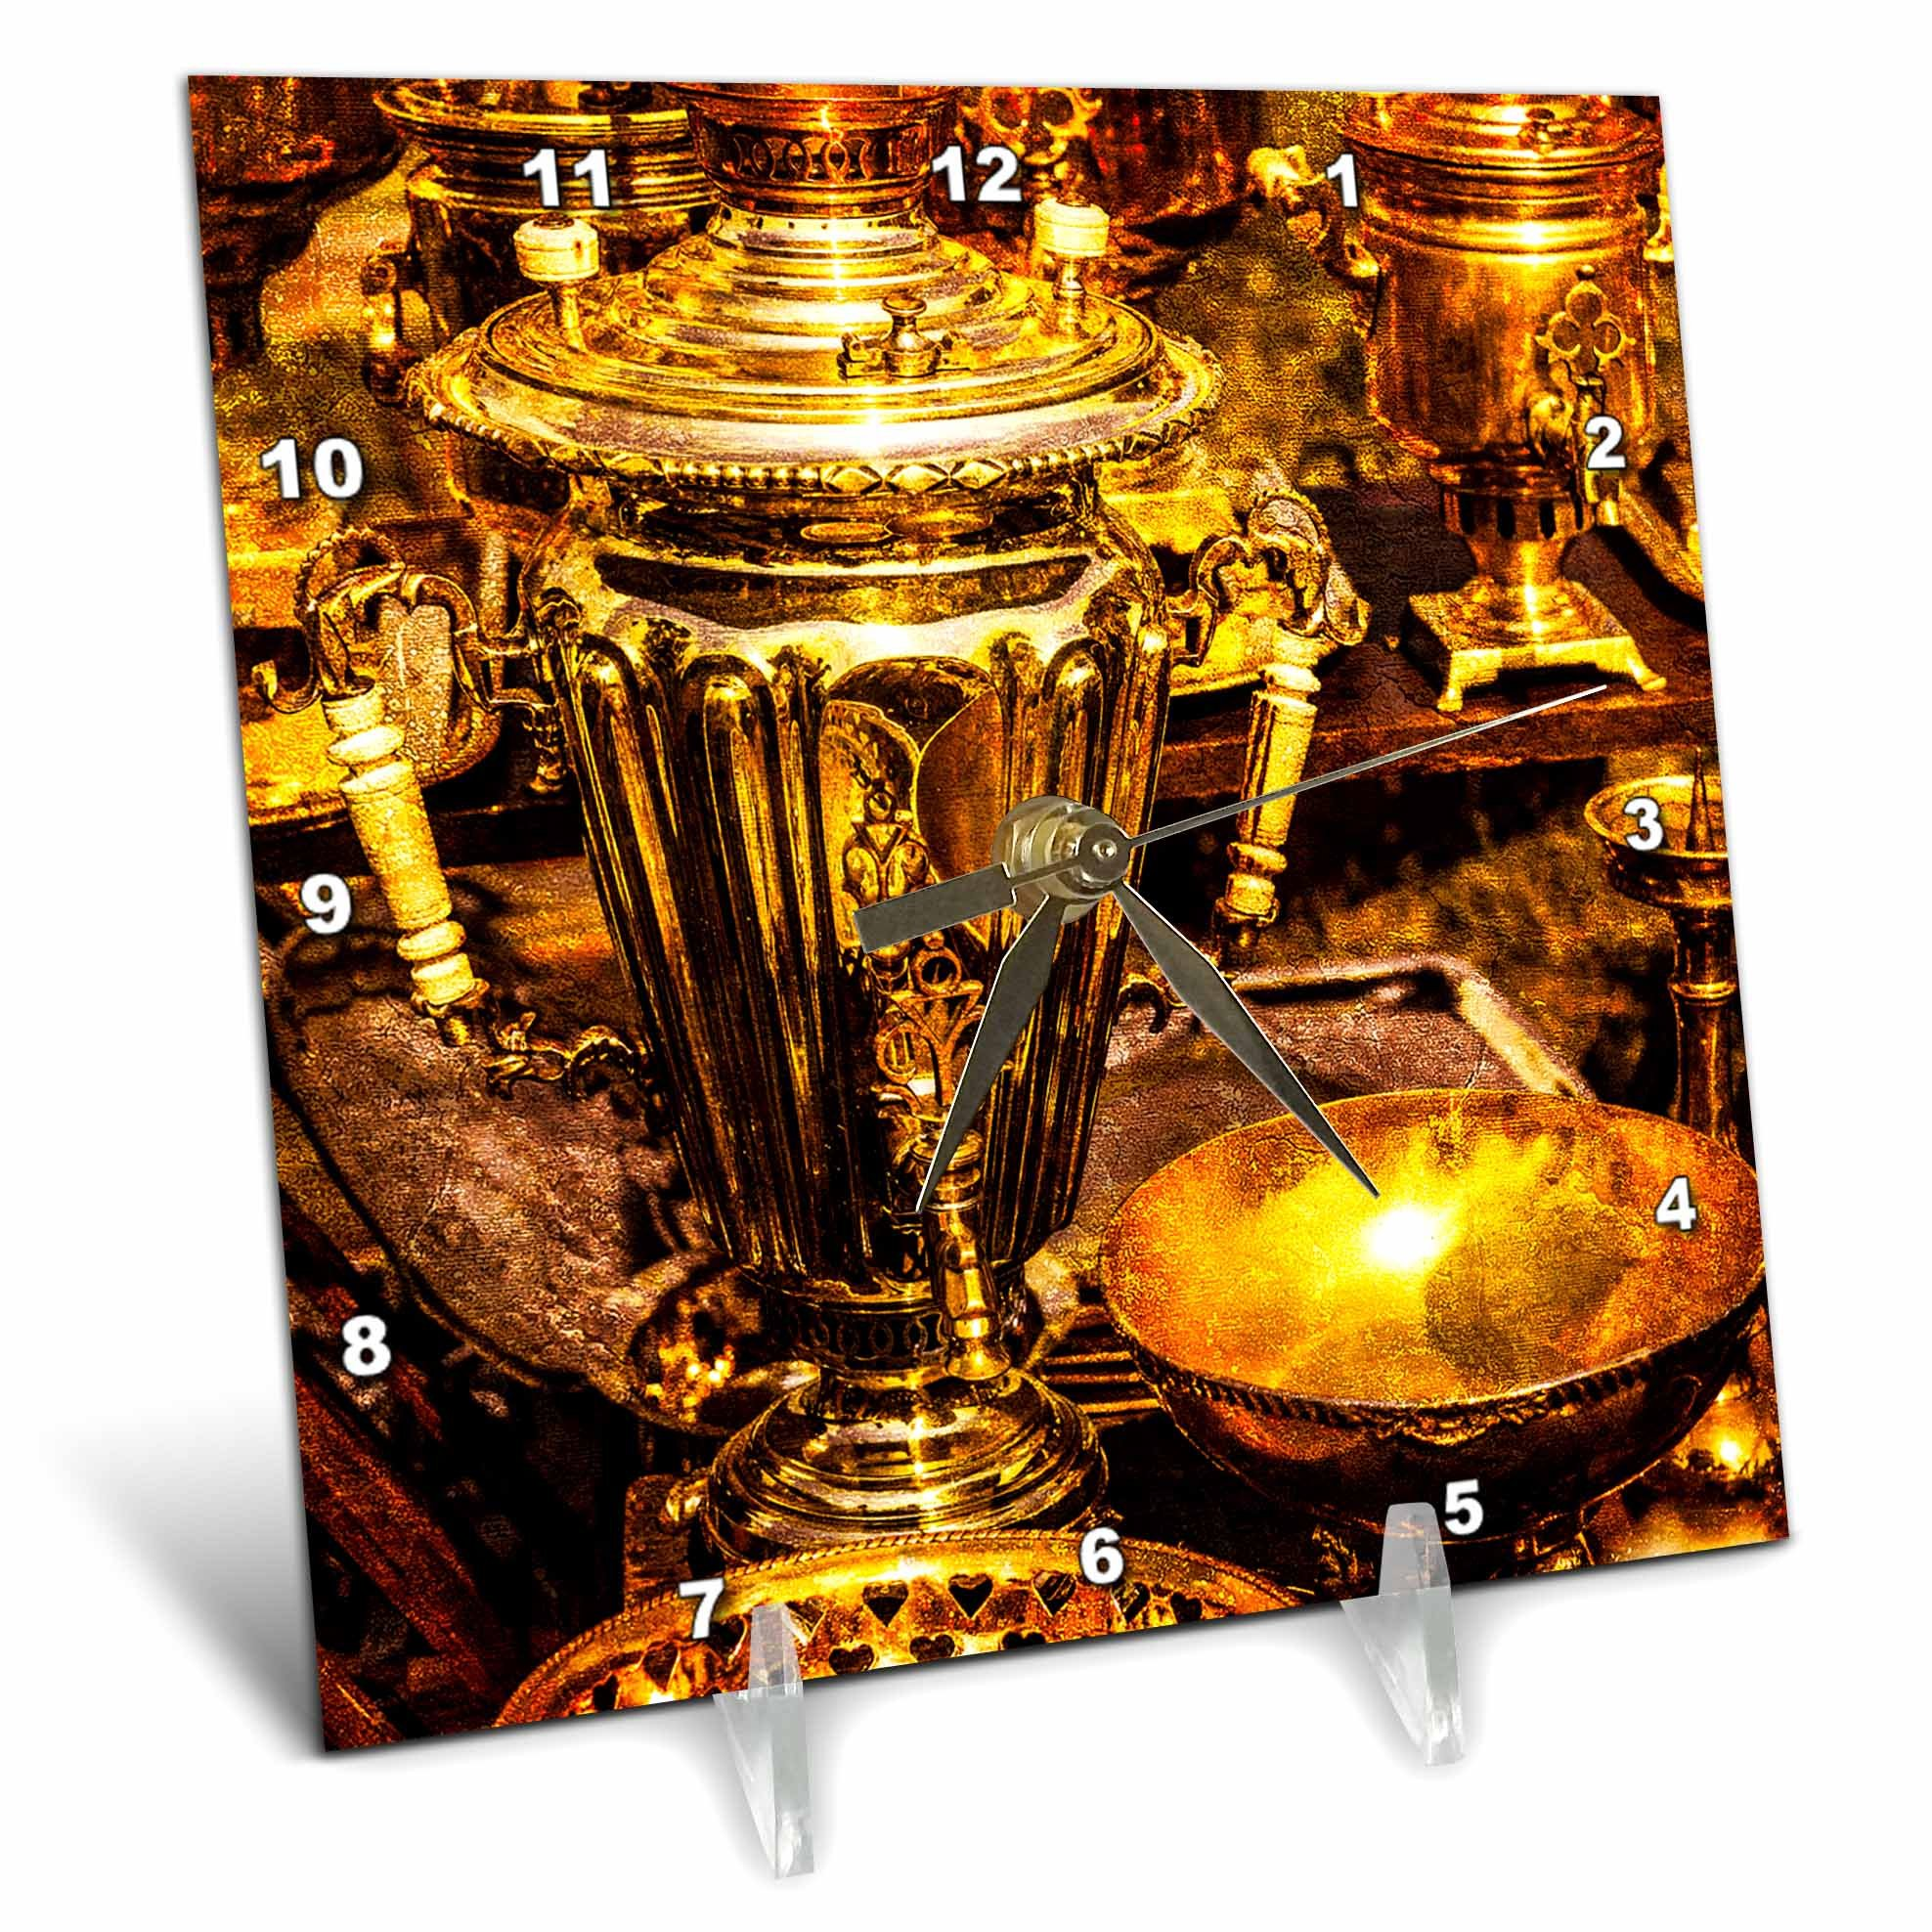 3dRose Alexis Photography - Objects - Golden age technologies - Samovar or fire tea pot. Stylized photo - 6x6 Desk Clock (dc_270870_1)